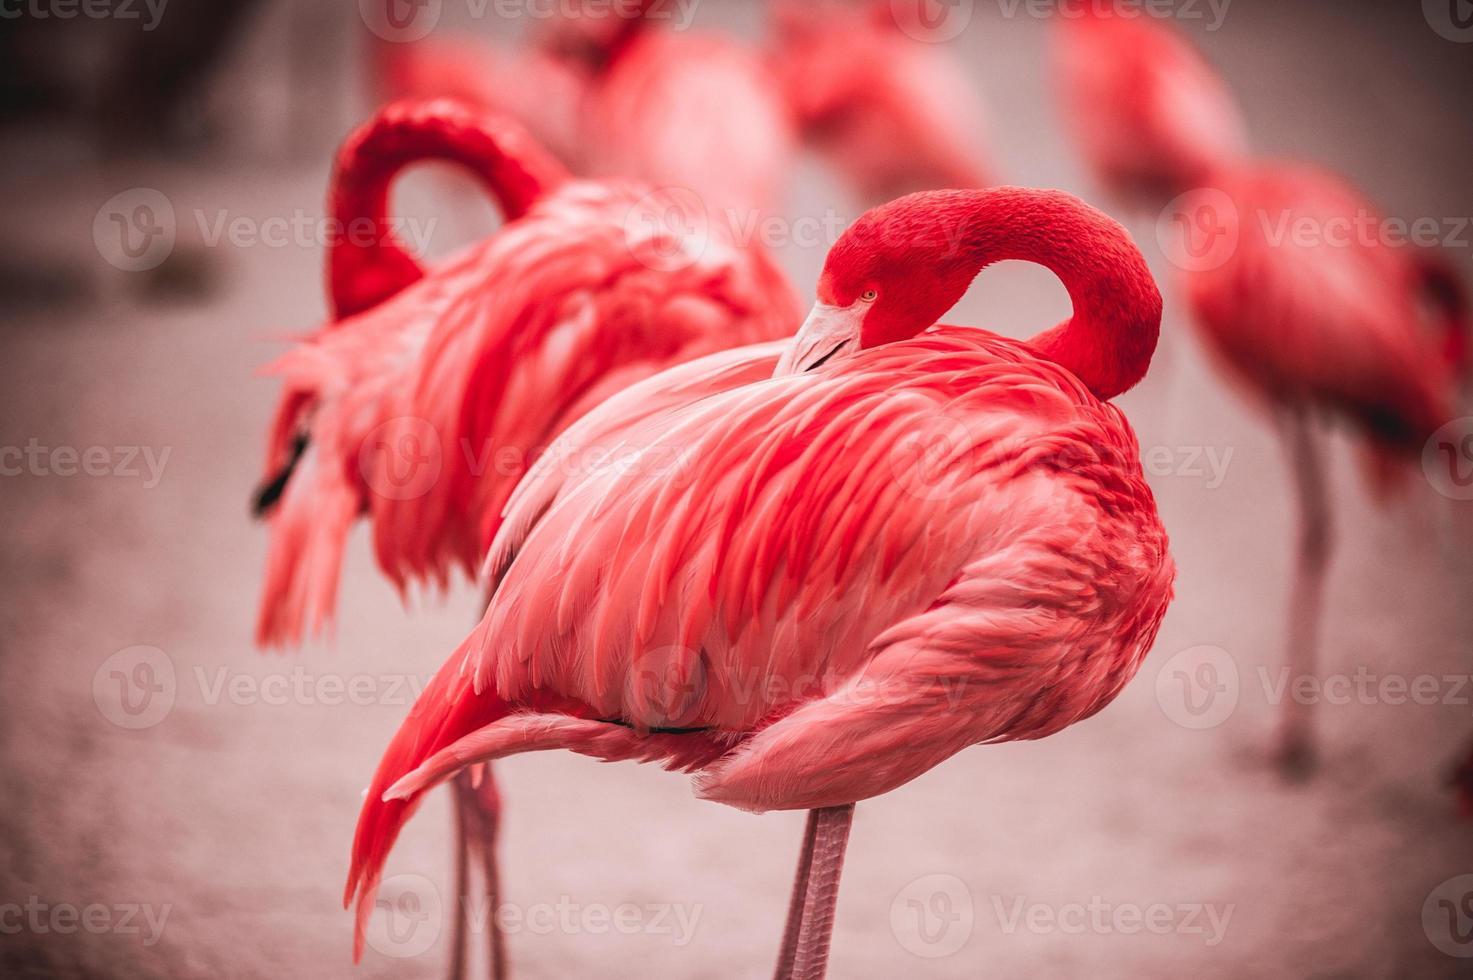 roze flamingo's tegen groene achtergrond foto